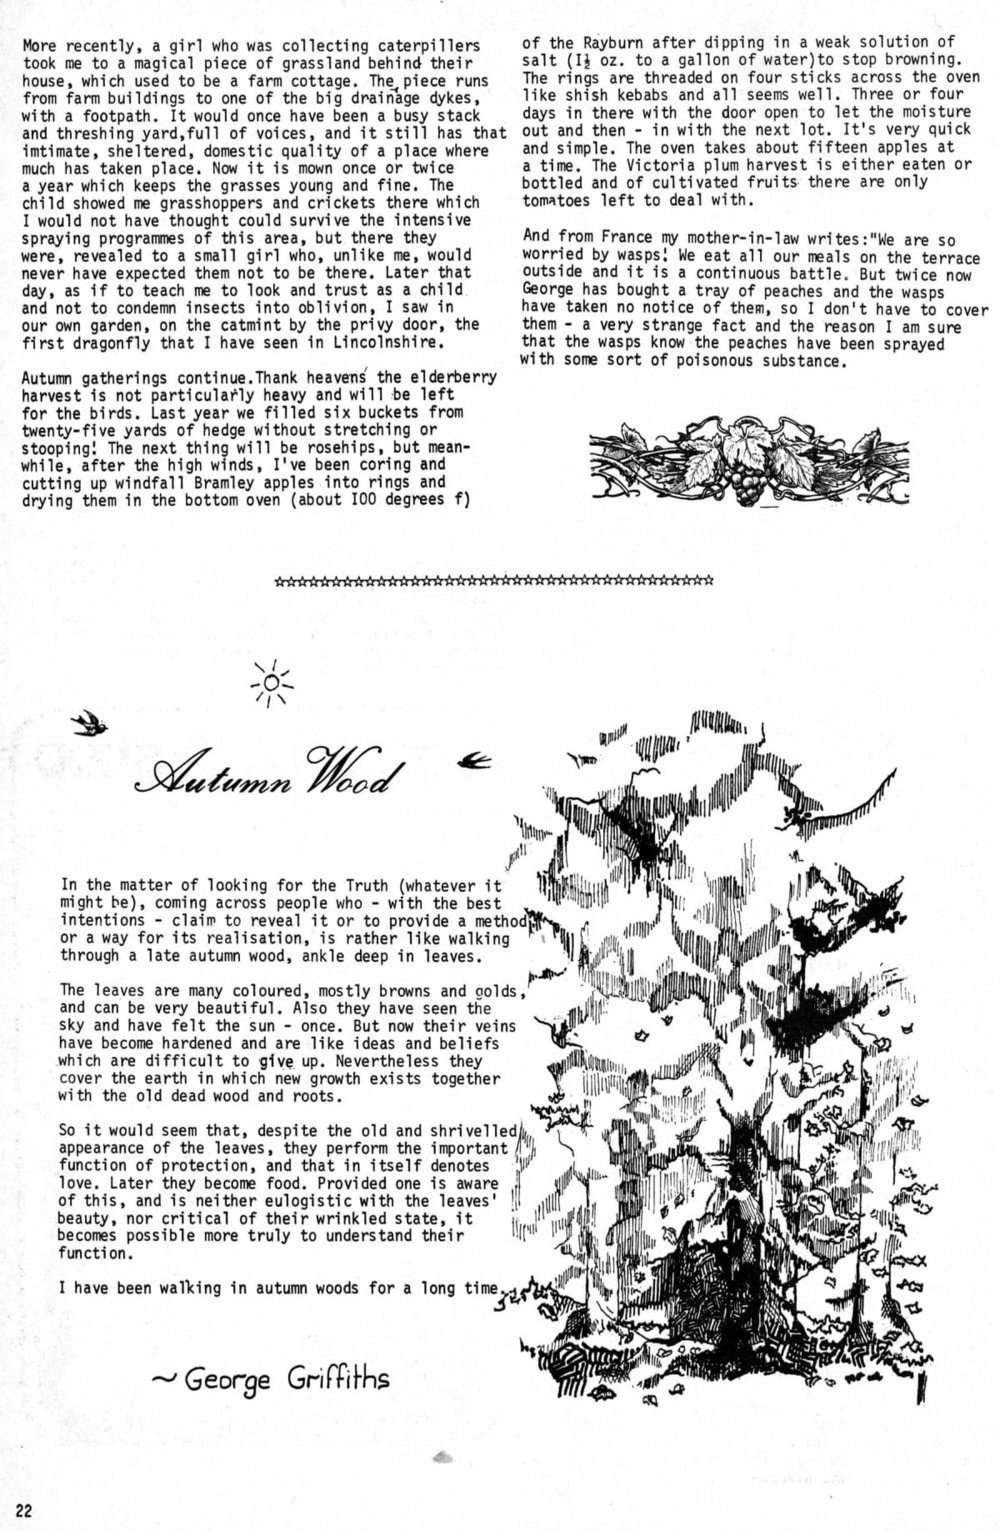 seed-v3-n10-oct1974-22.jpg